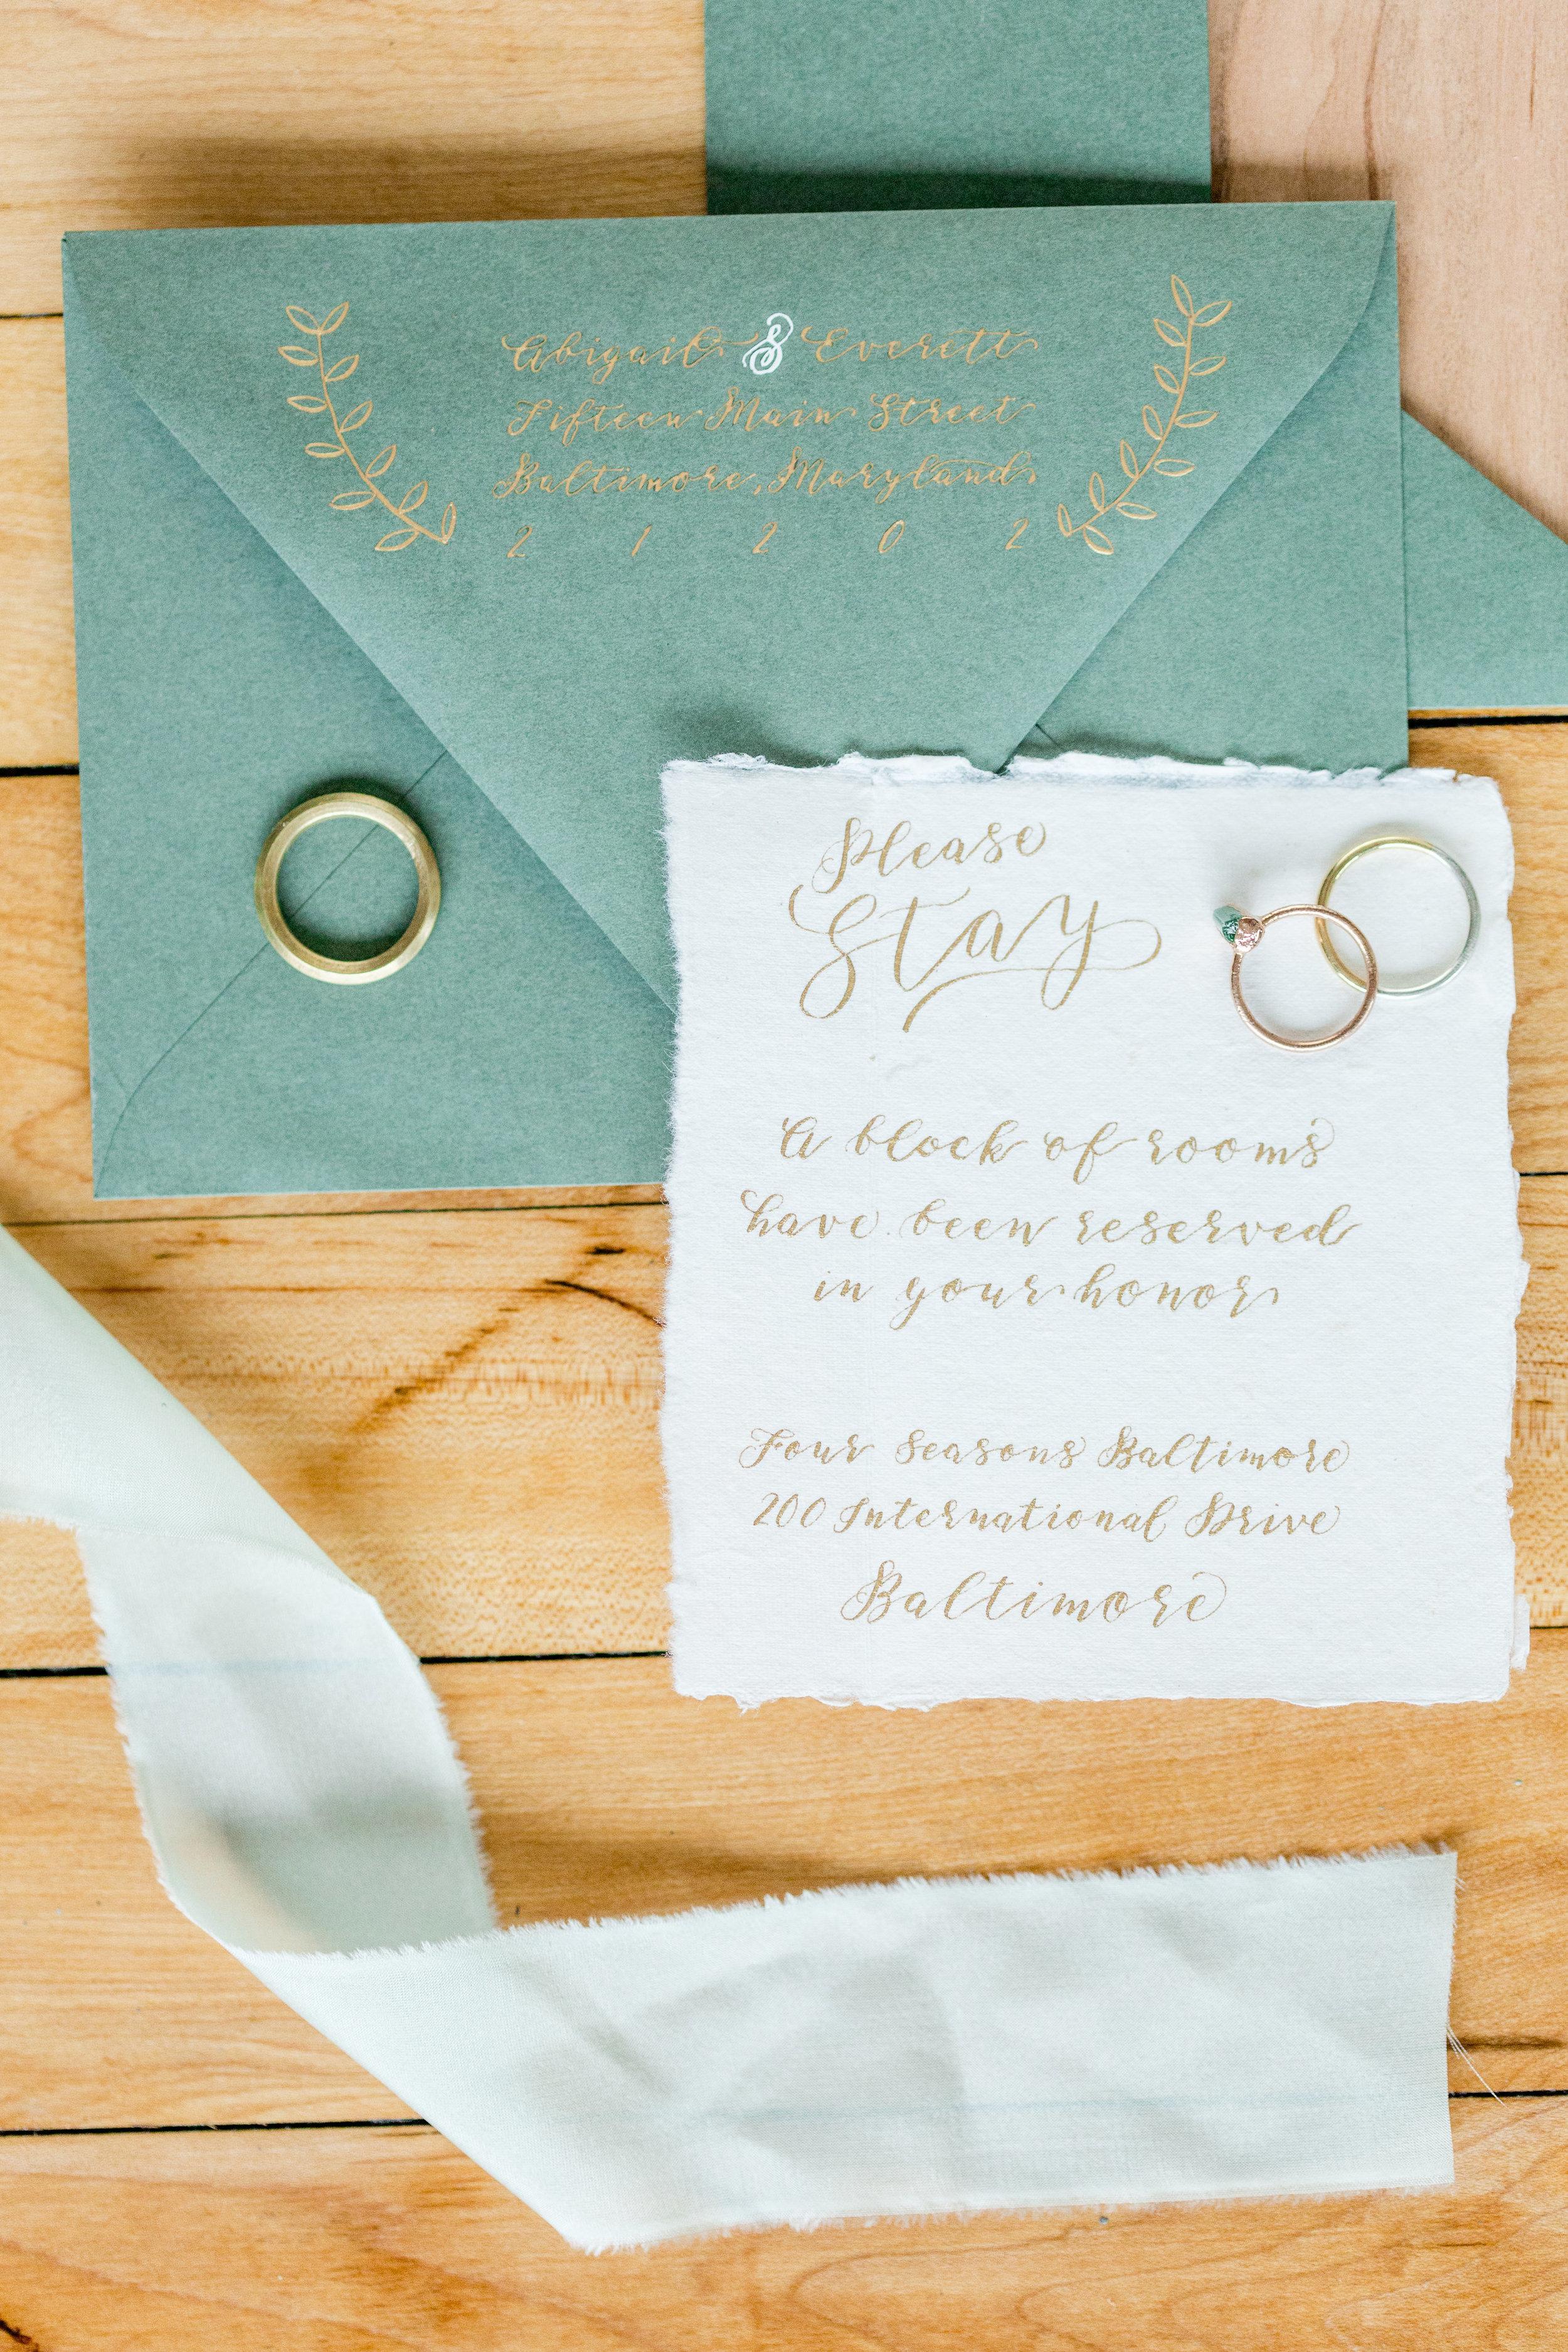 Central PA, York PA, JesSmith Designs, custom, wedding, invitations, bridal, announcements, save the date, birth, baby, motherhood, hanover, calligraphy, handlettering_046.jpg